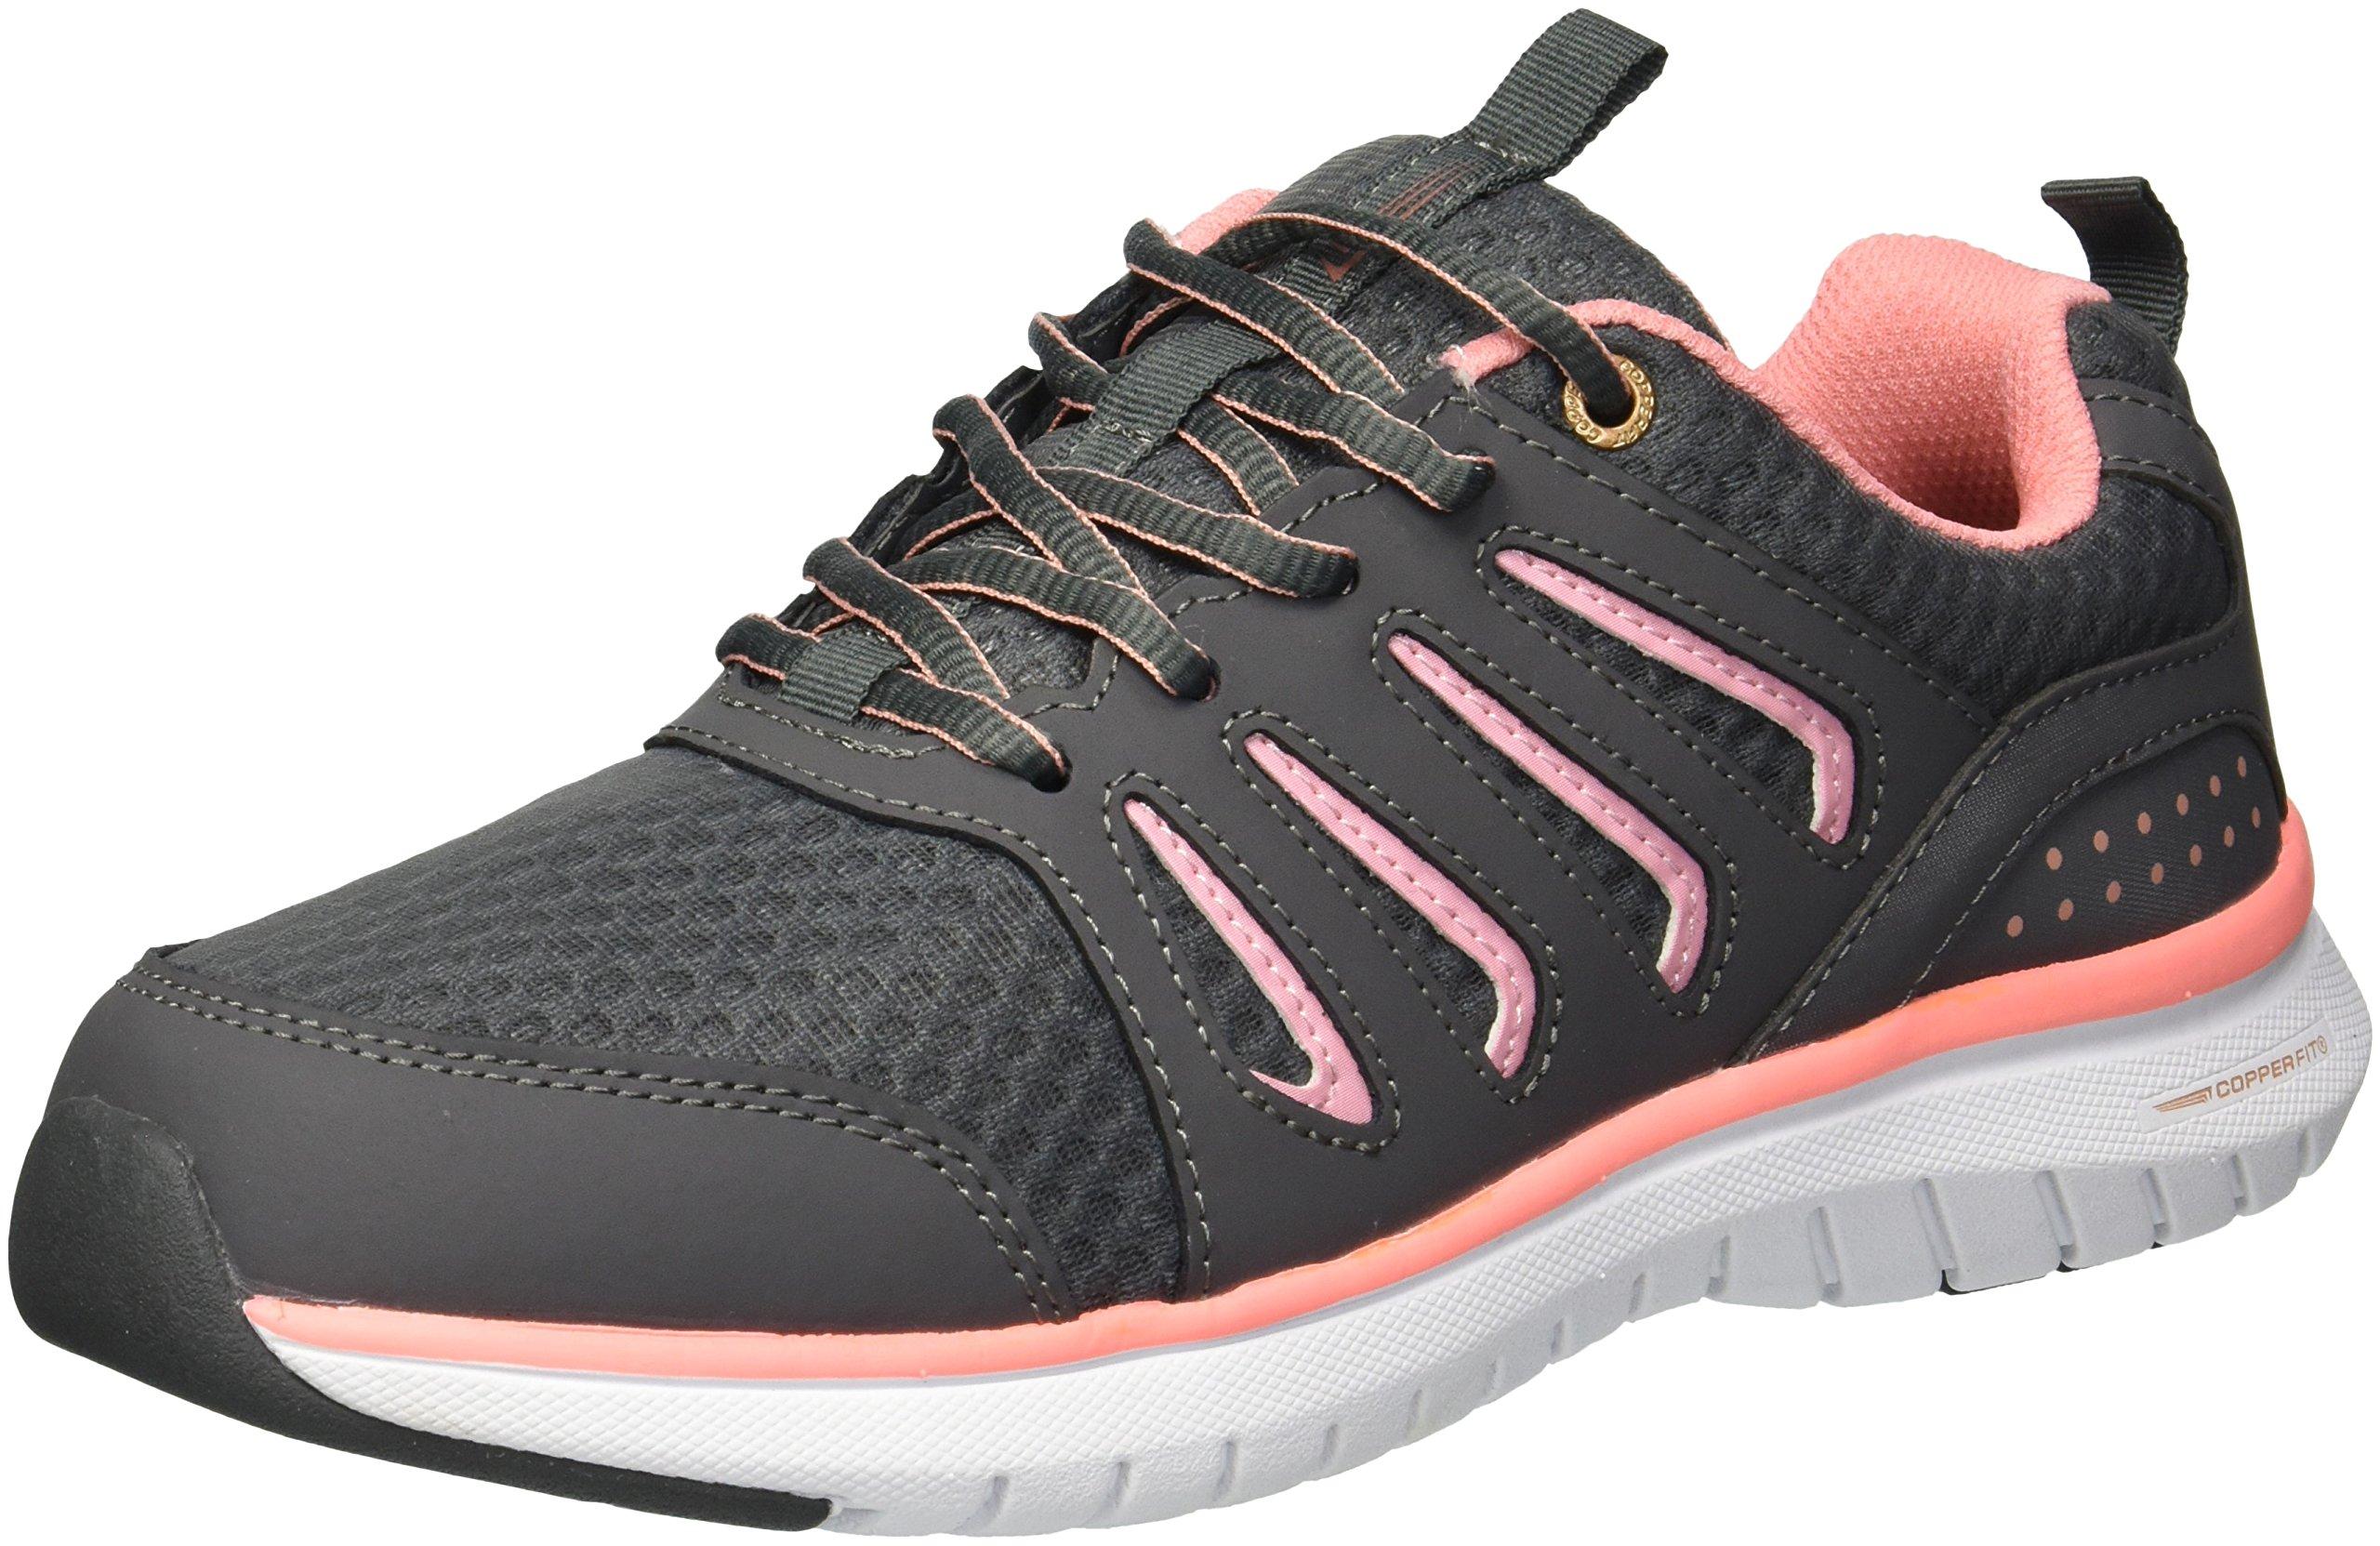 Copper Fit Women's Pace Lace up Sneaker, Grey, 8.5 M US